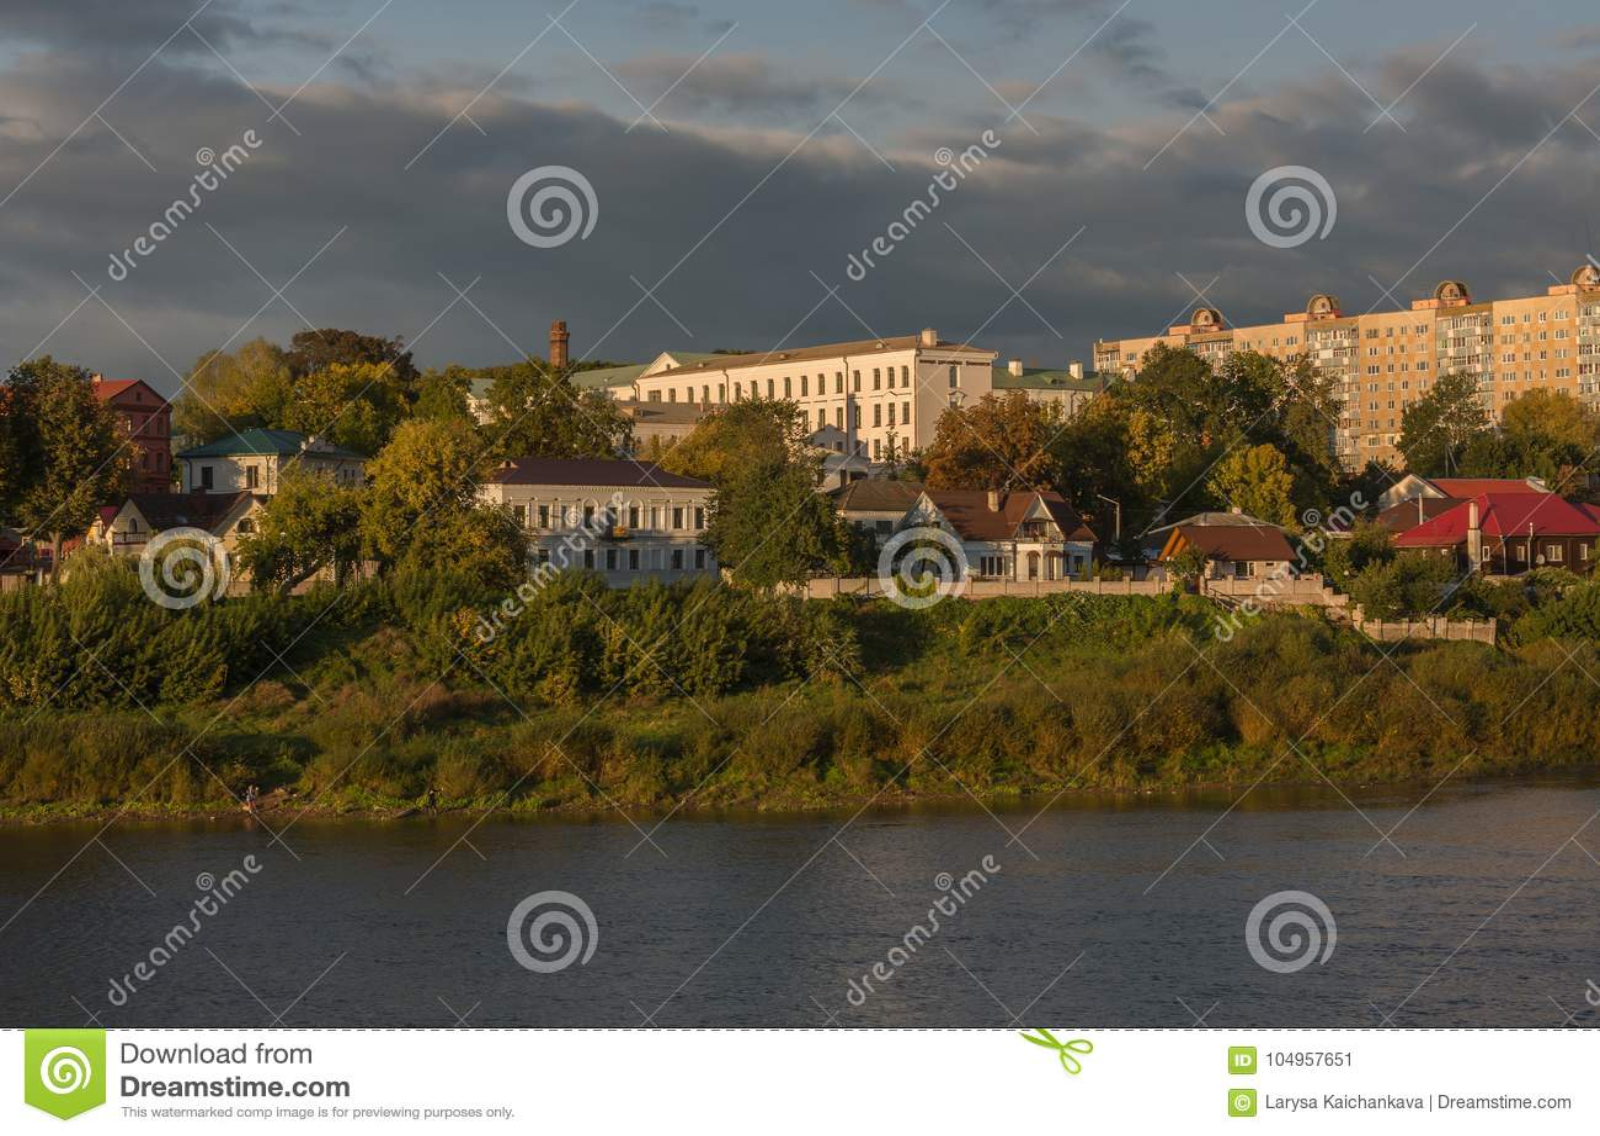 Polotsk State University in Vitebsk region 82